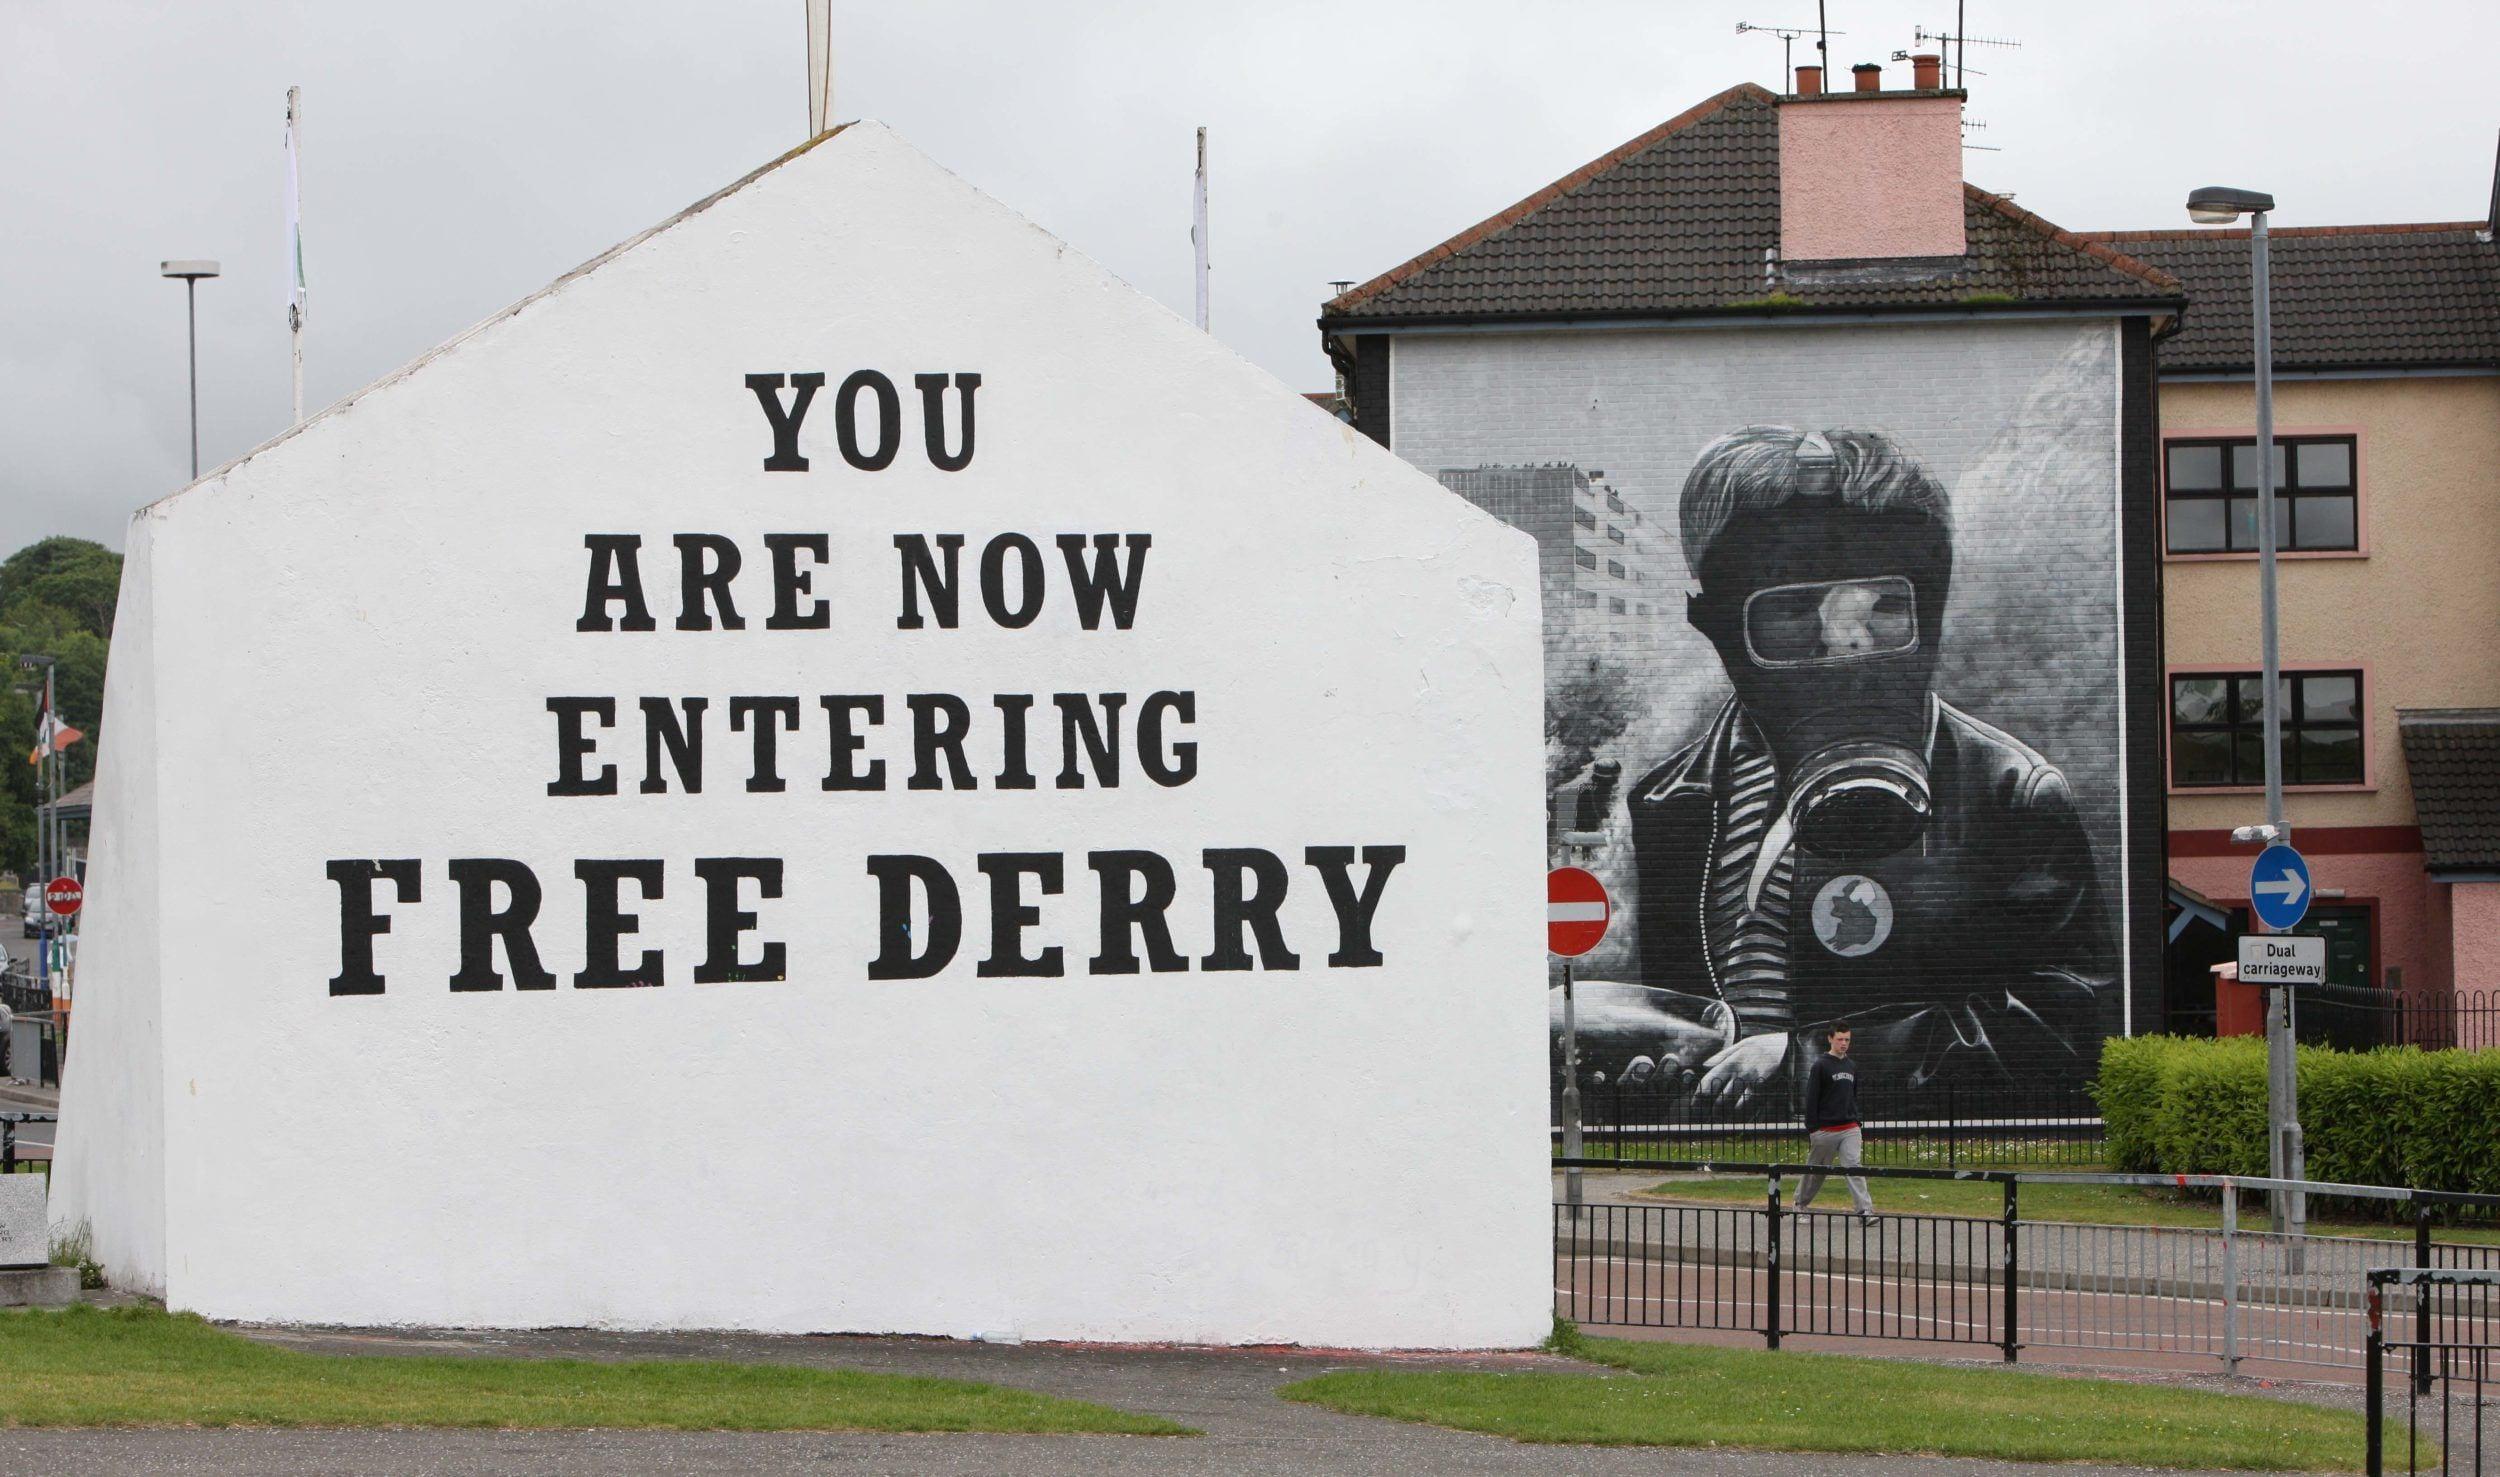 Free Derry Corner Gas Mask Images